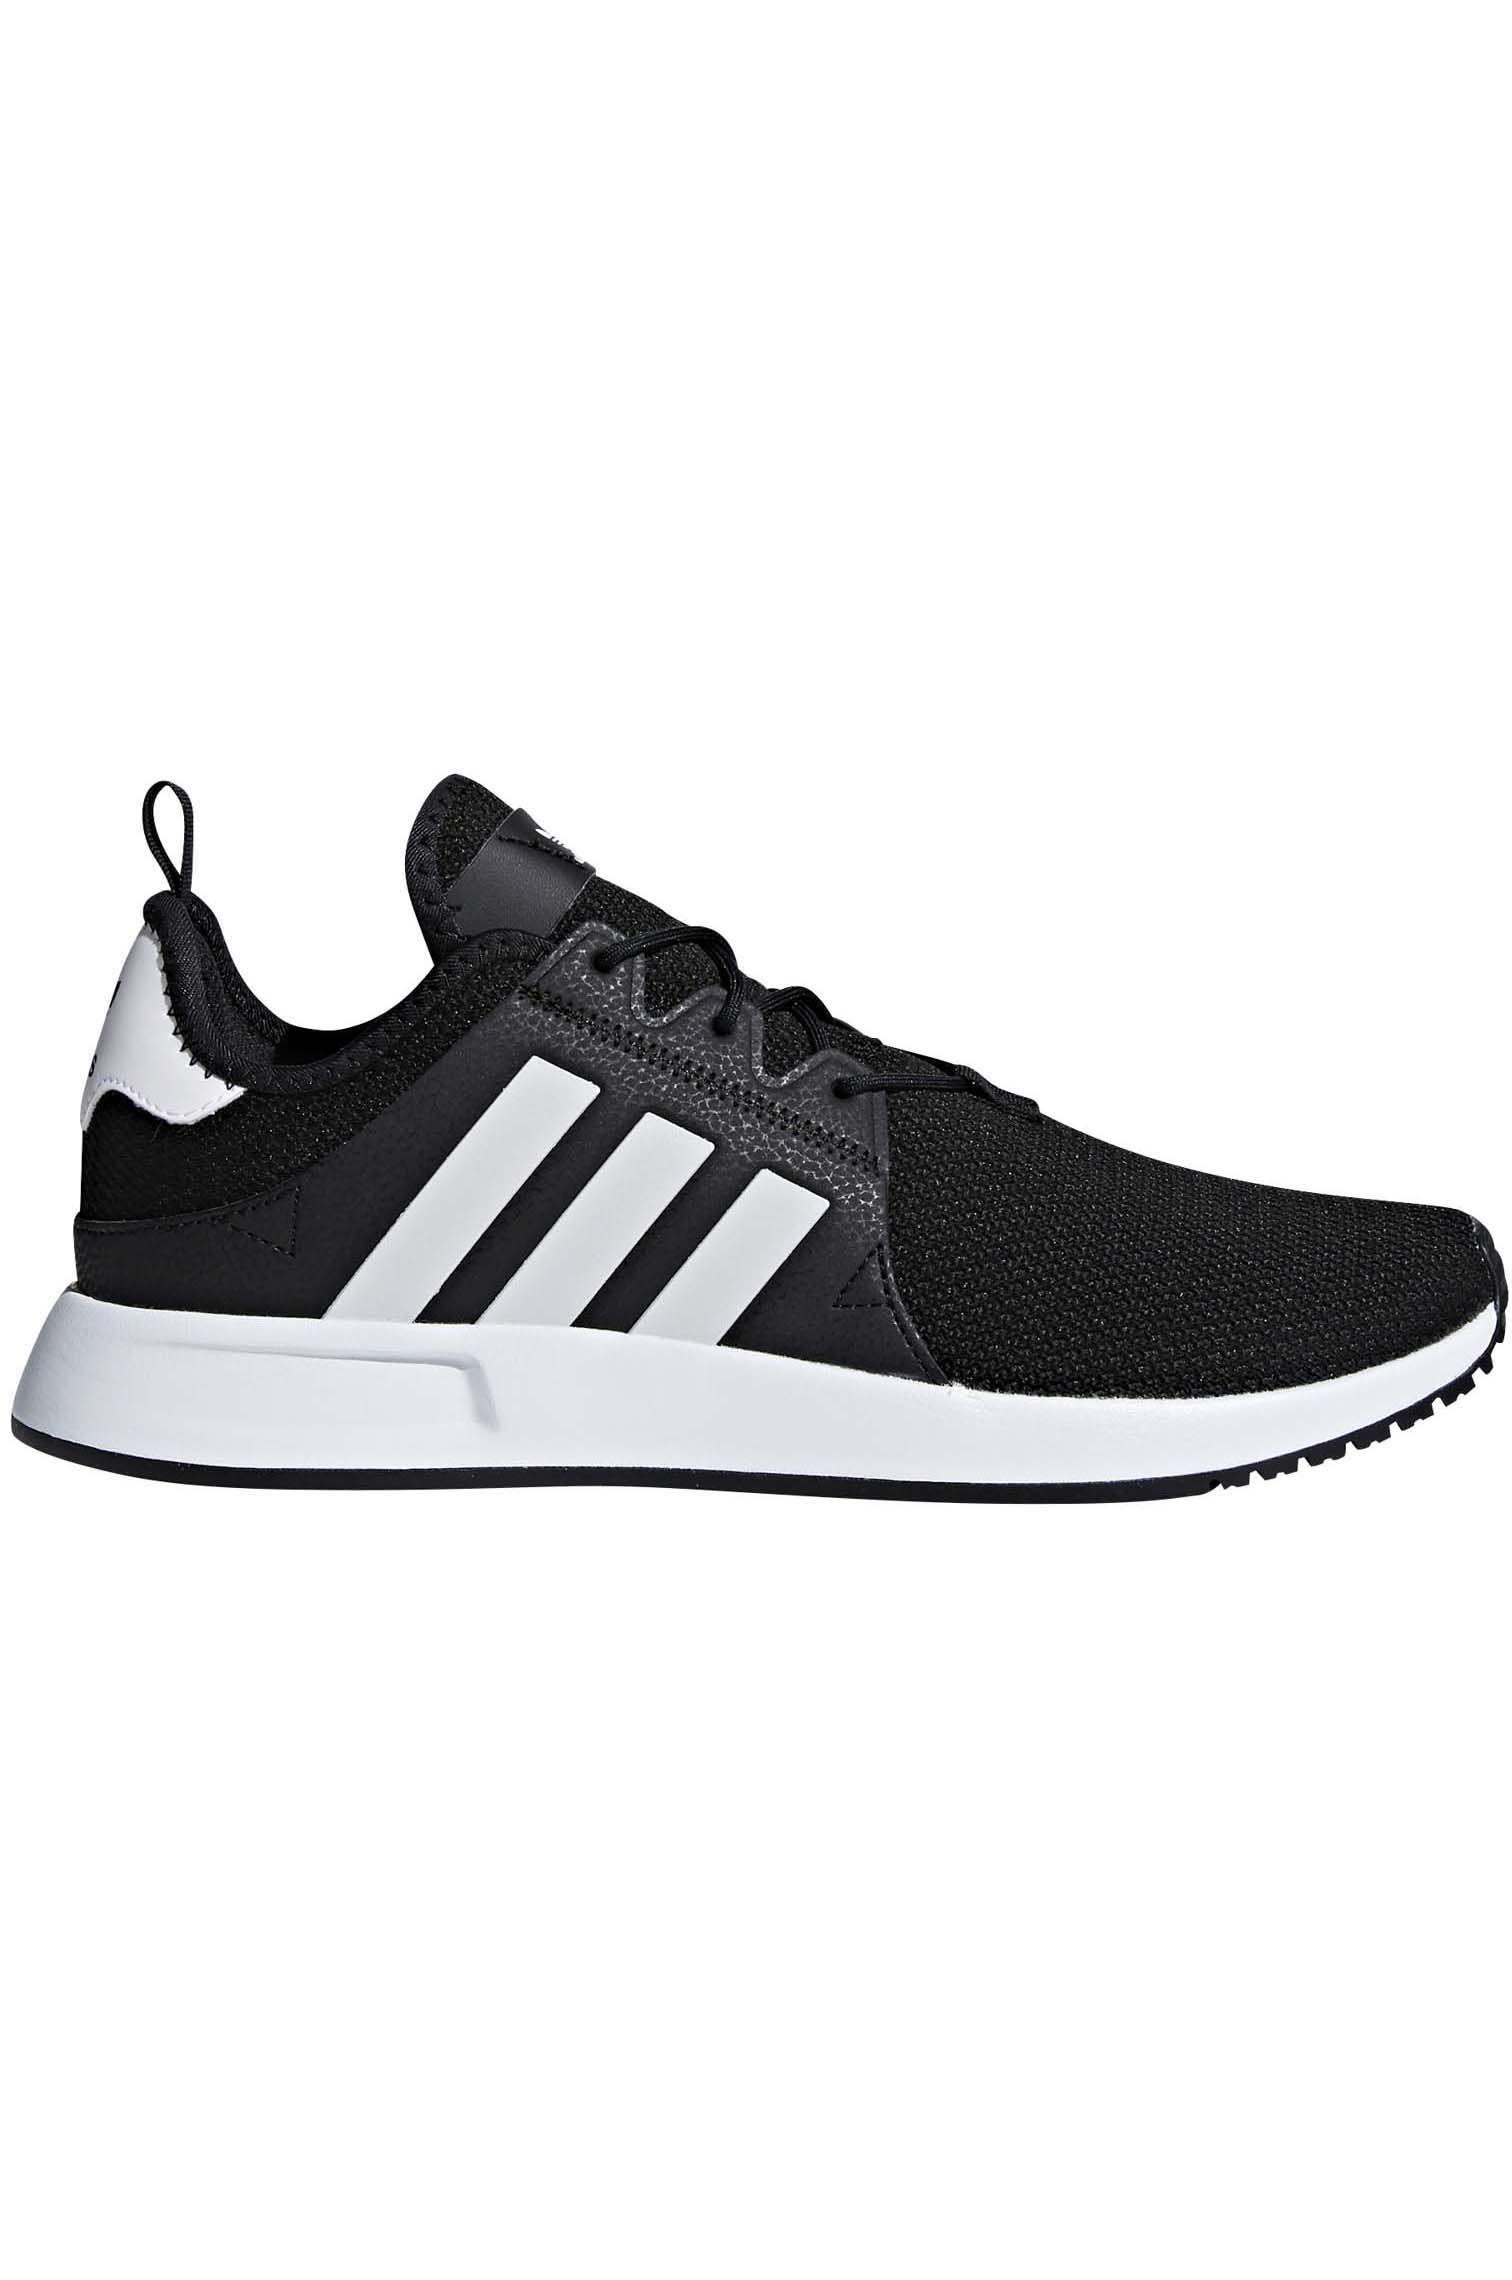 Tenis Adidas X_PLR Core Black/Ftwr White/Core Black